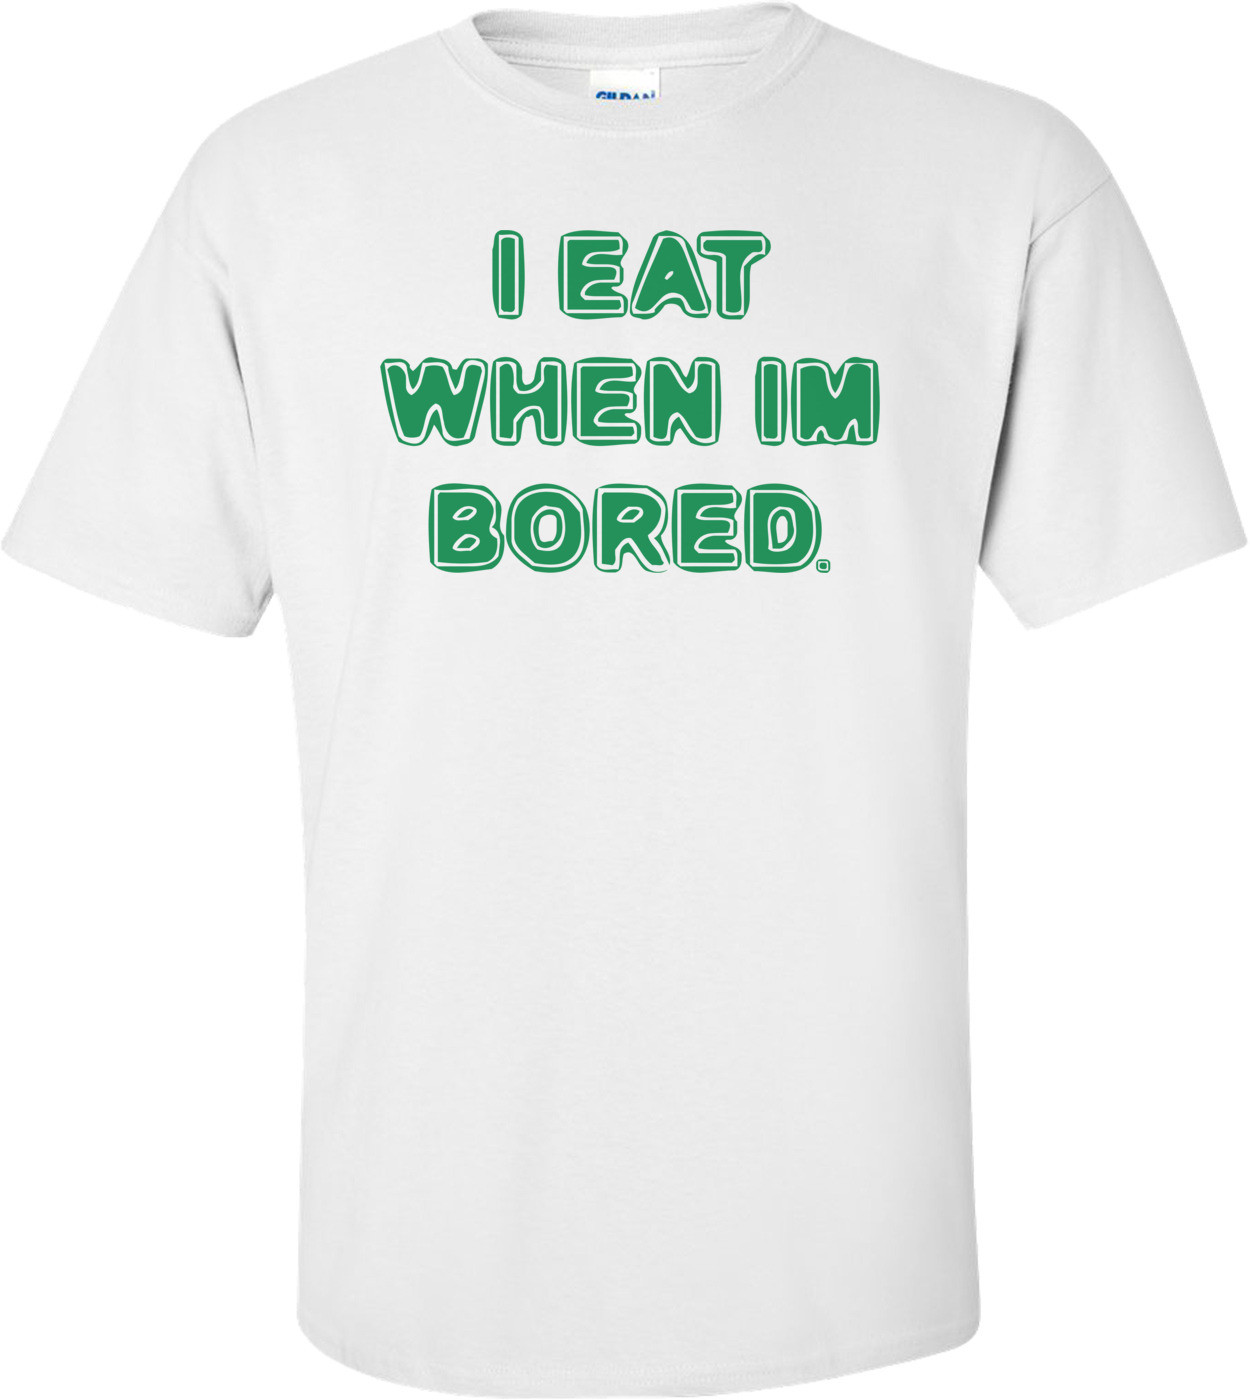 I EAT WHEN IM BORED. Shirt